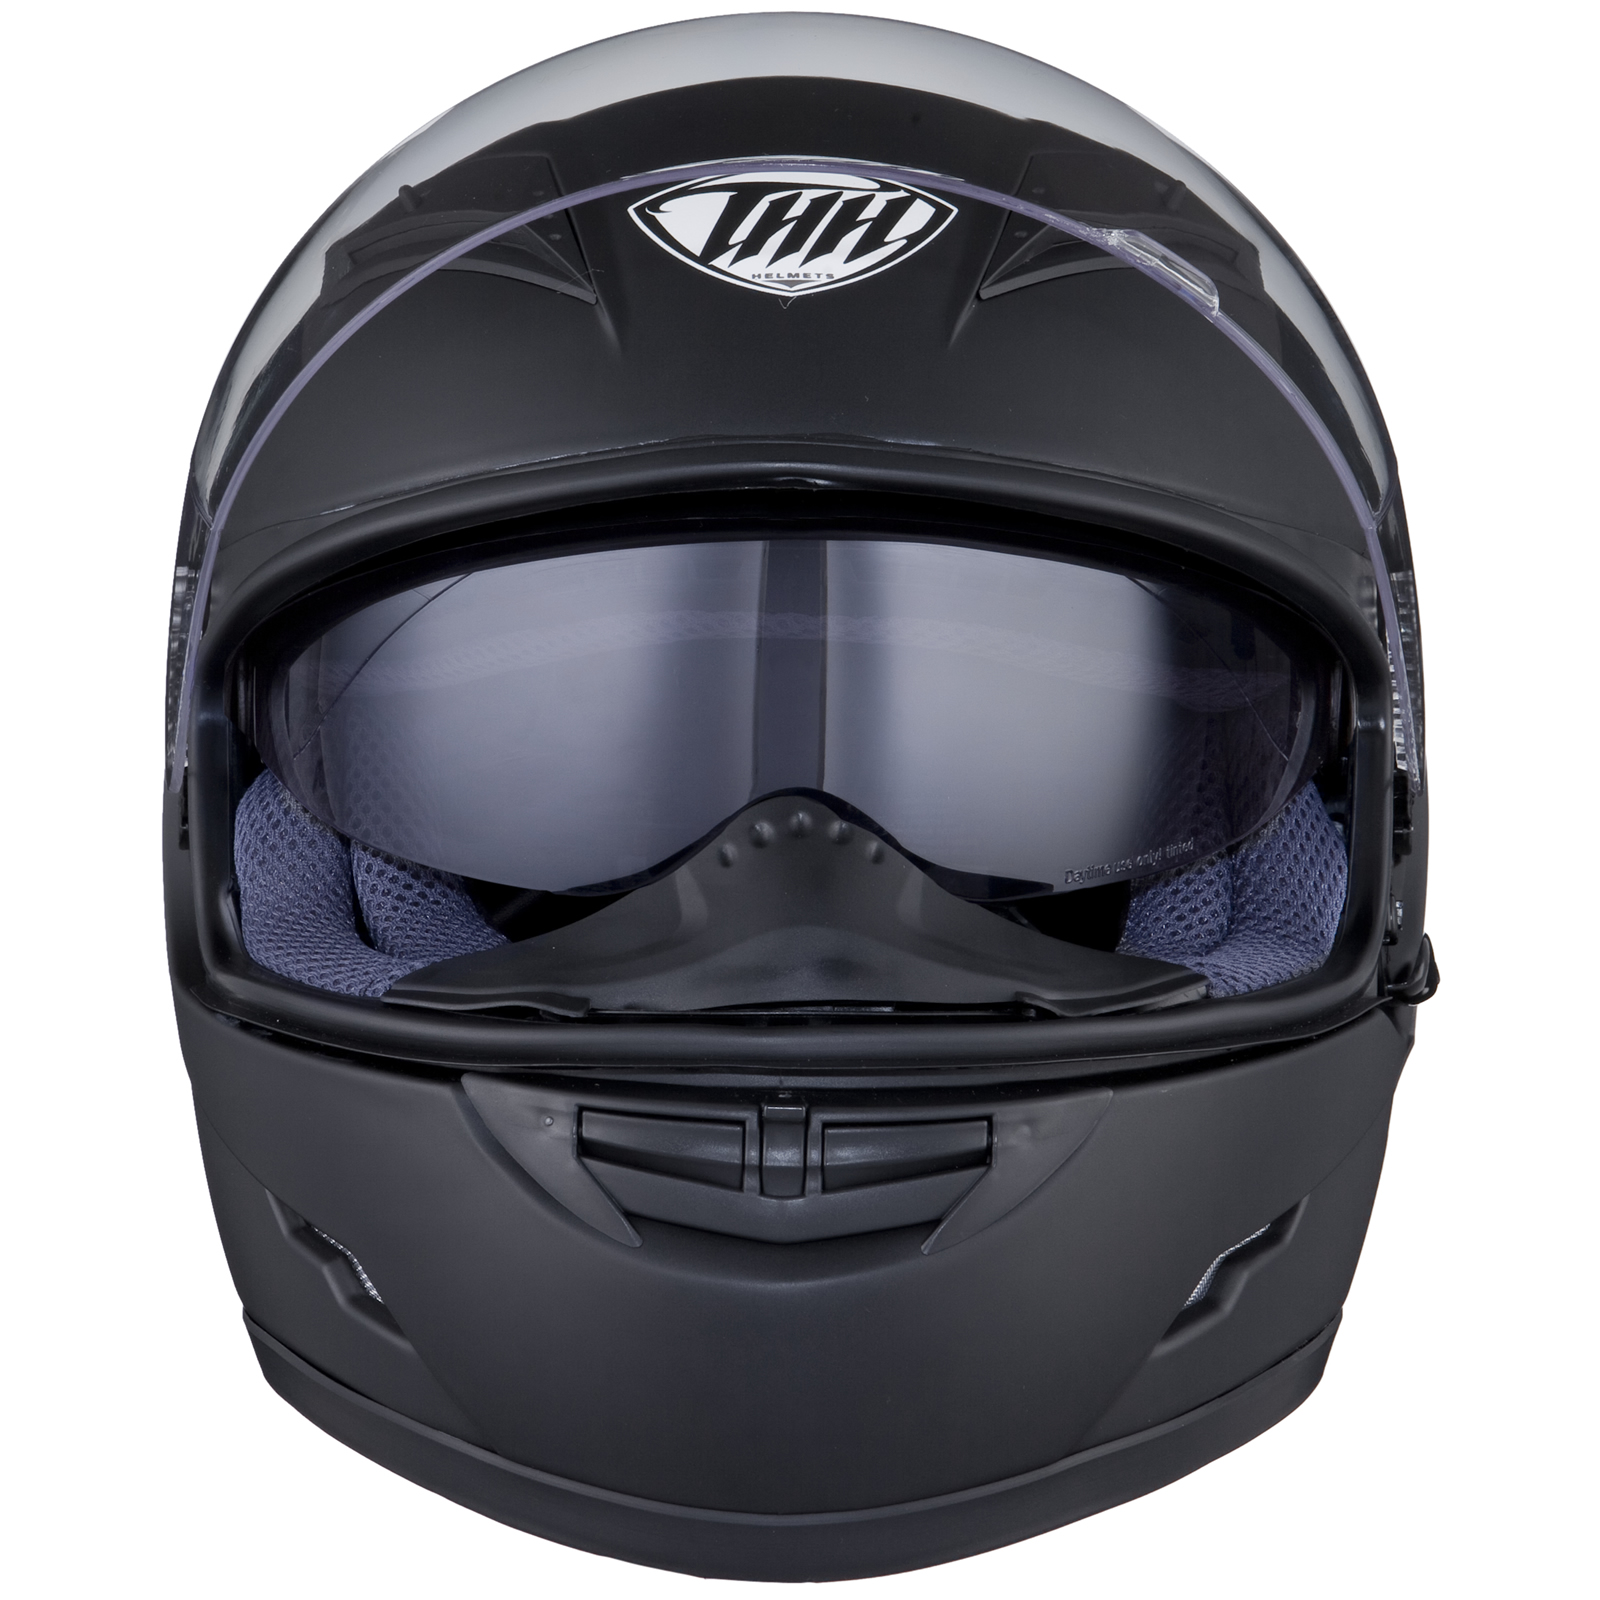 THH TS-80 Plain Matt Black Motorcycle Helmet Motorbike ...